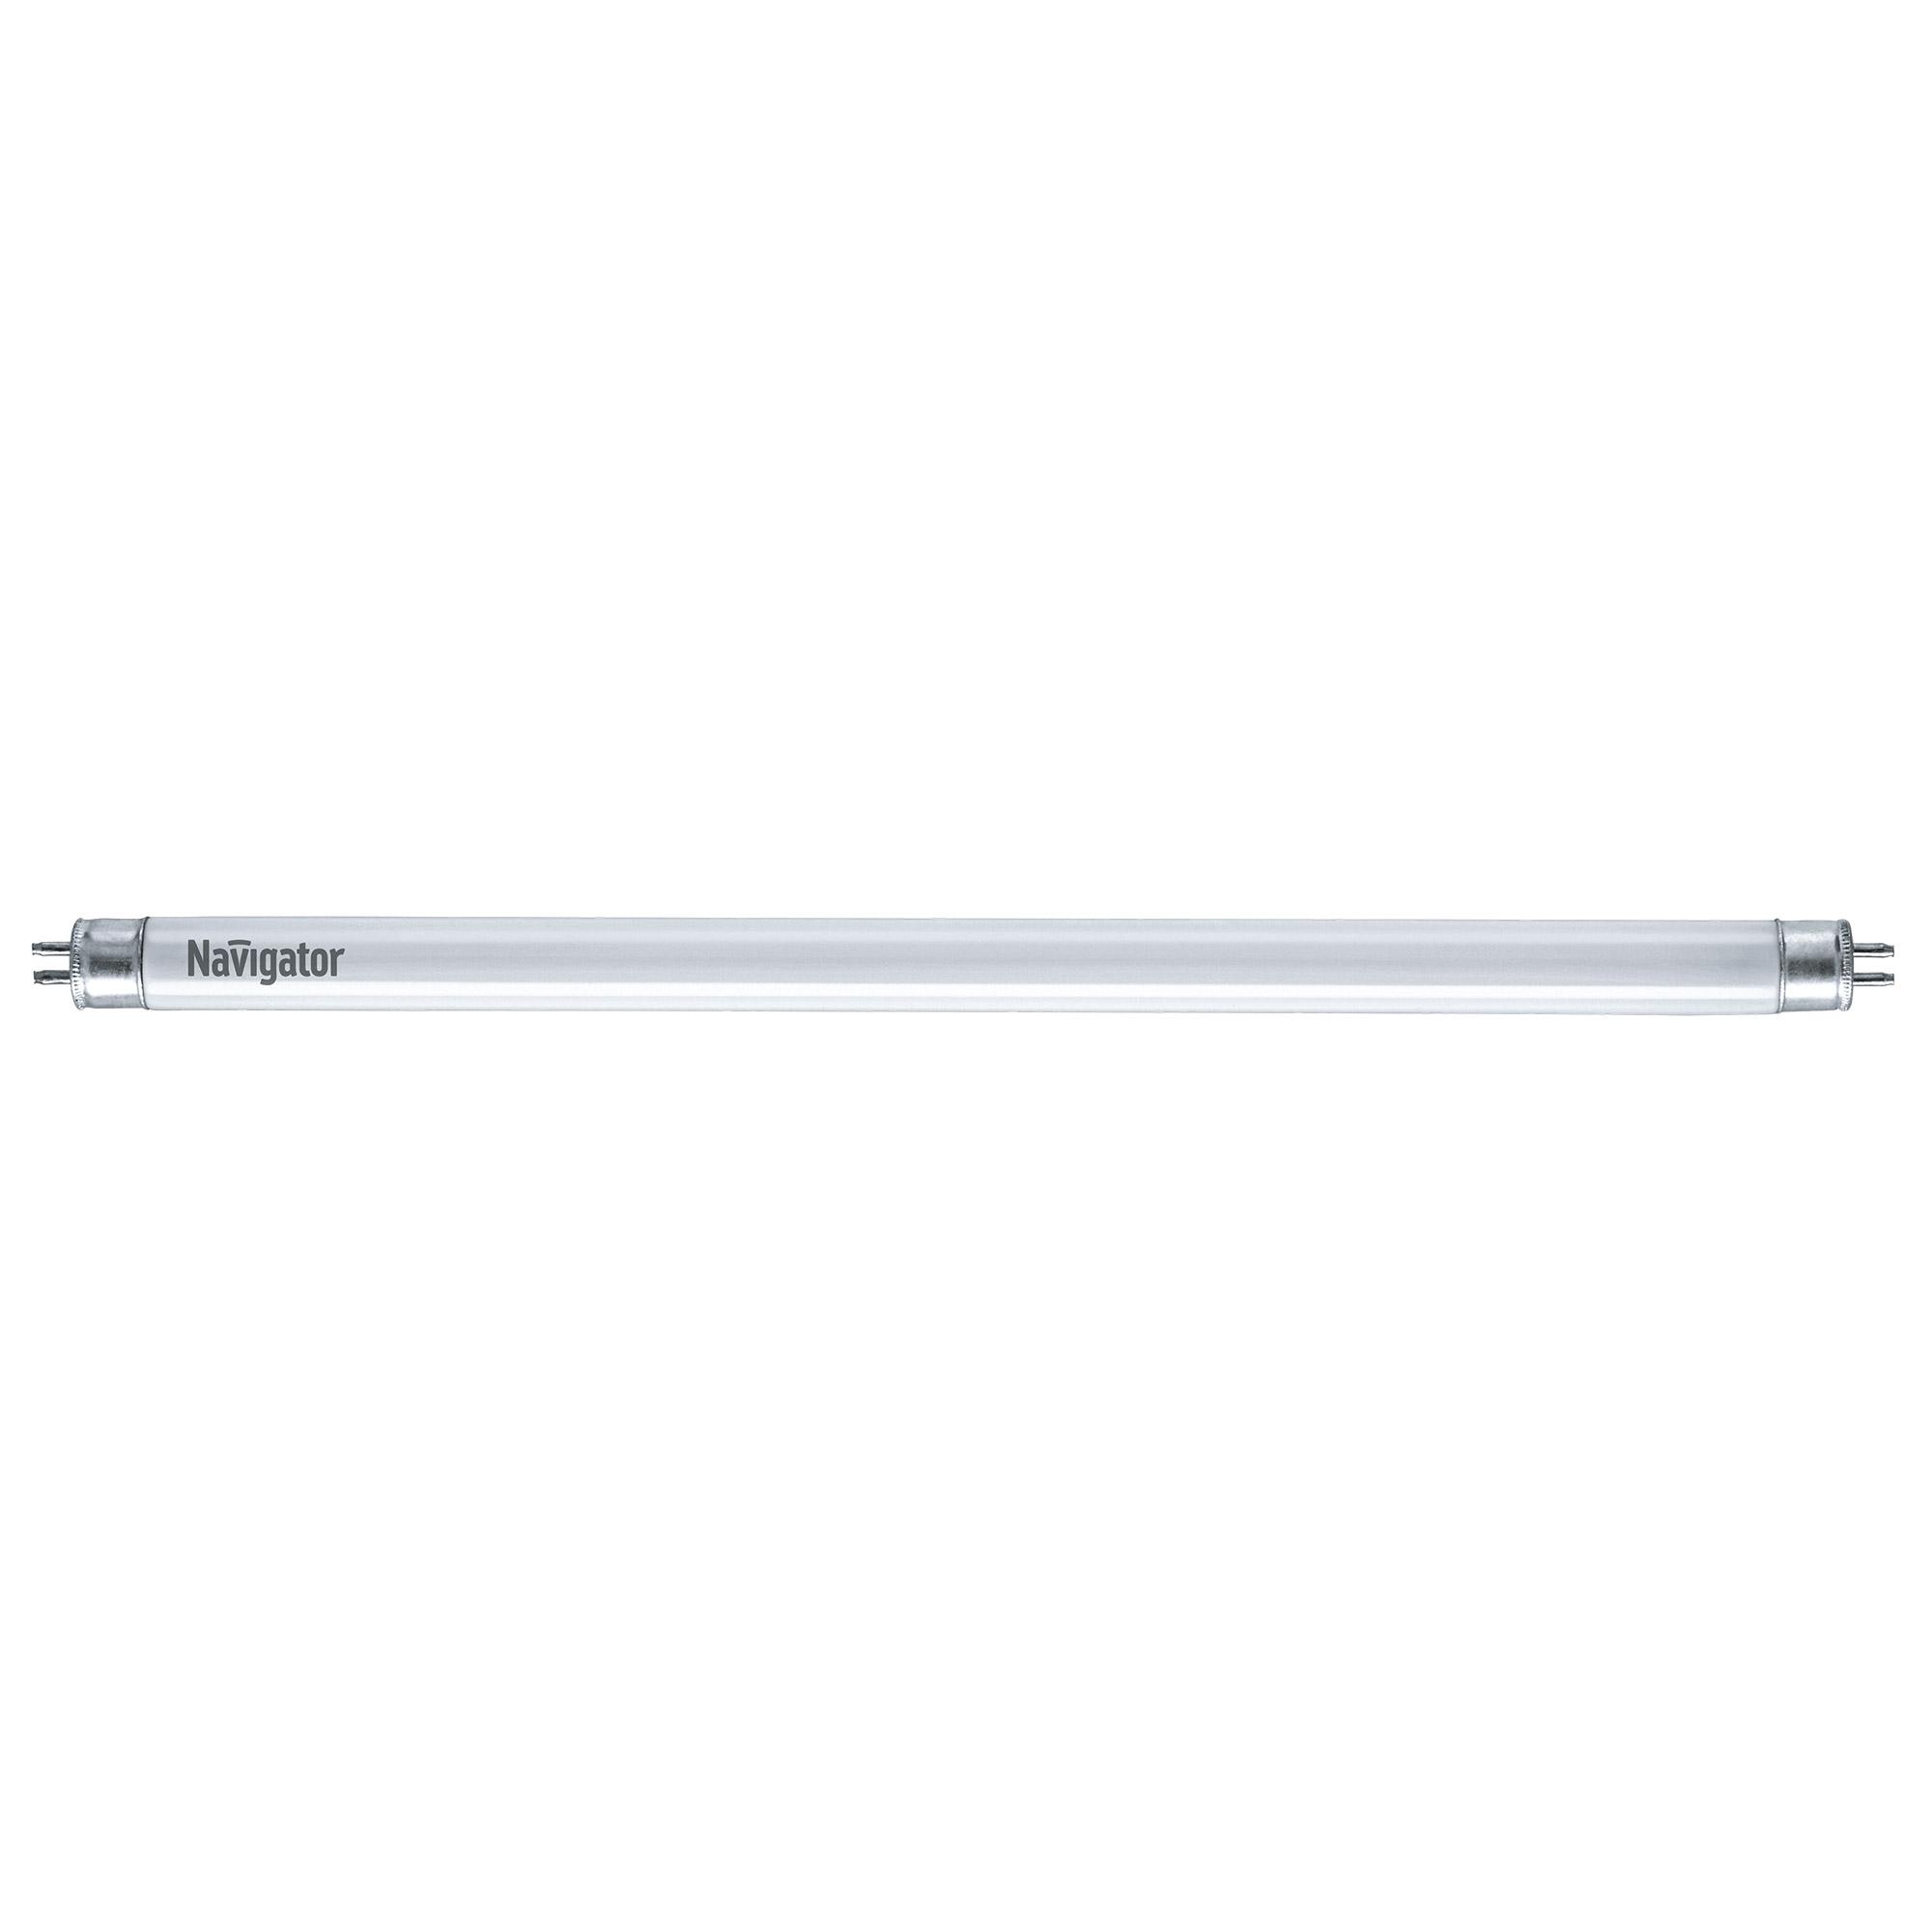 Фото - Лампа люминесцентная Navigator T5 6Вт цоколь G5 (холодный свет) лампа люминесцентная navigator t5 6вт цоколь g5 холодный свет